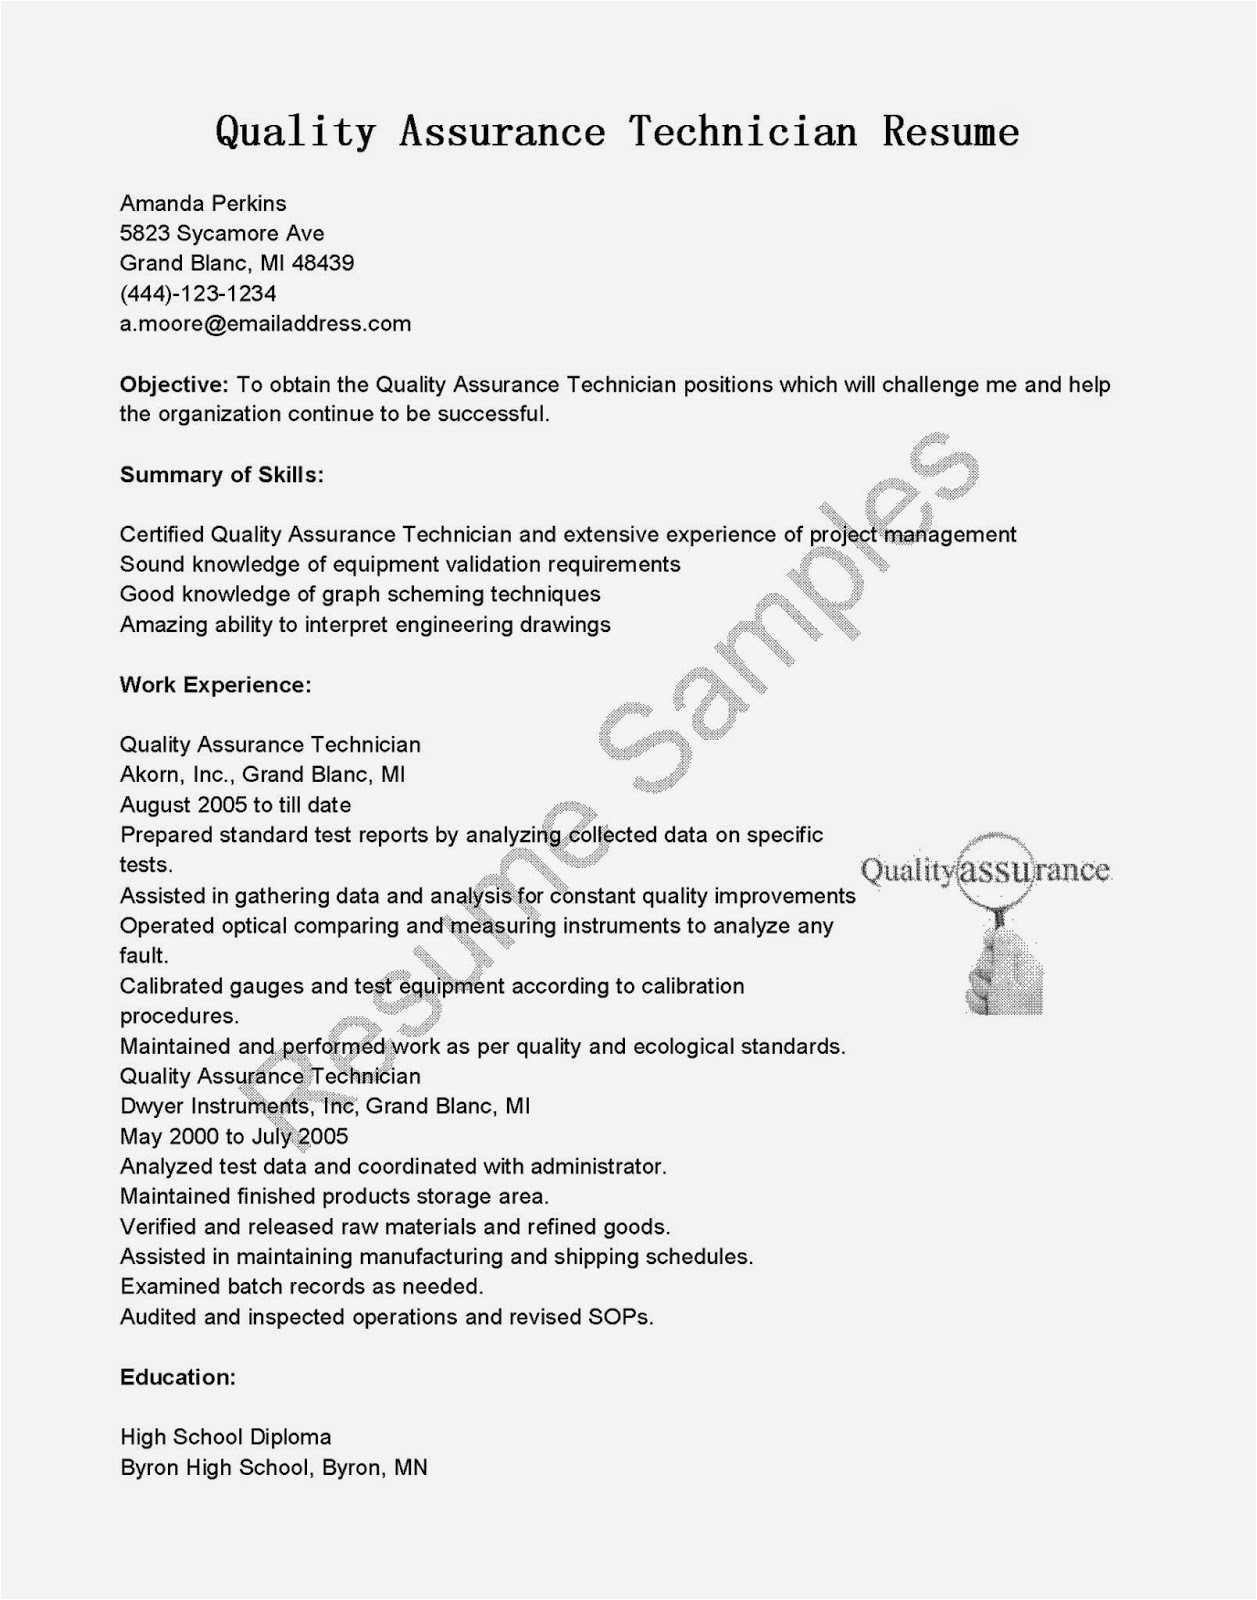 hair stylist resume objective 2019, beginner hair stylist resume objective, hair stylist assistant resume objective, hair stylist objective in a resume, career objective for hair stylist resume 2020, hair stylist resume objective examples